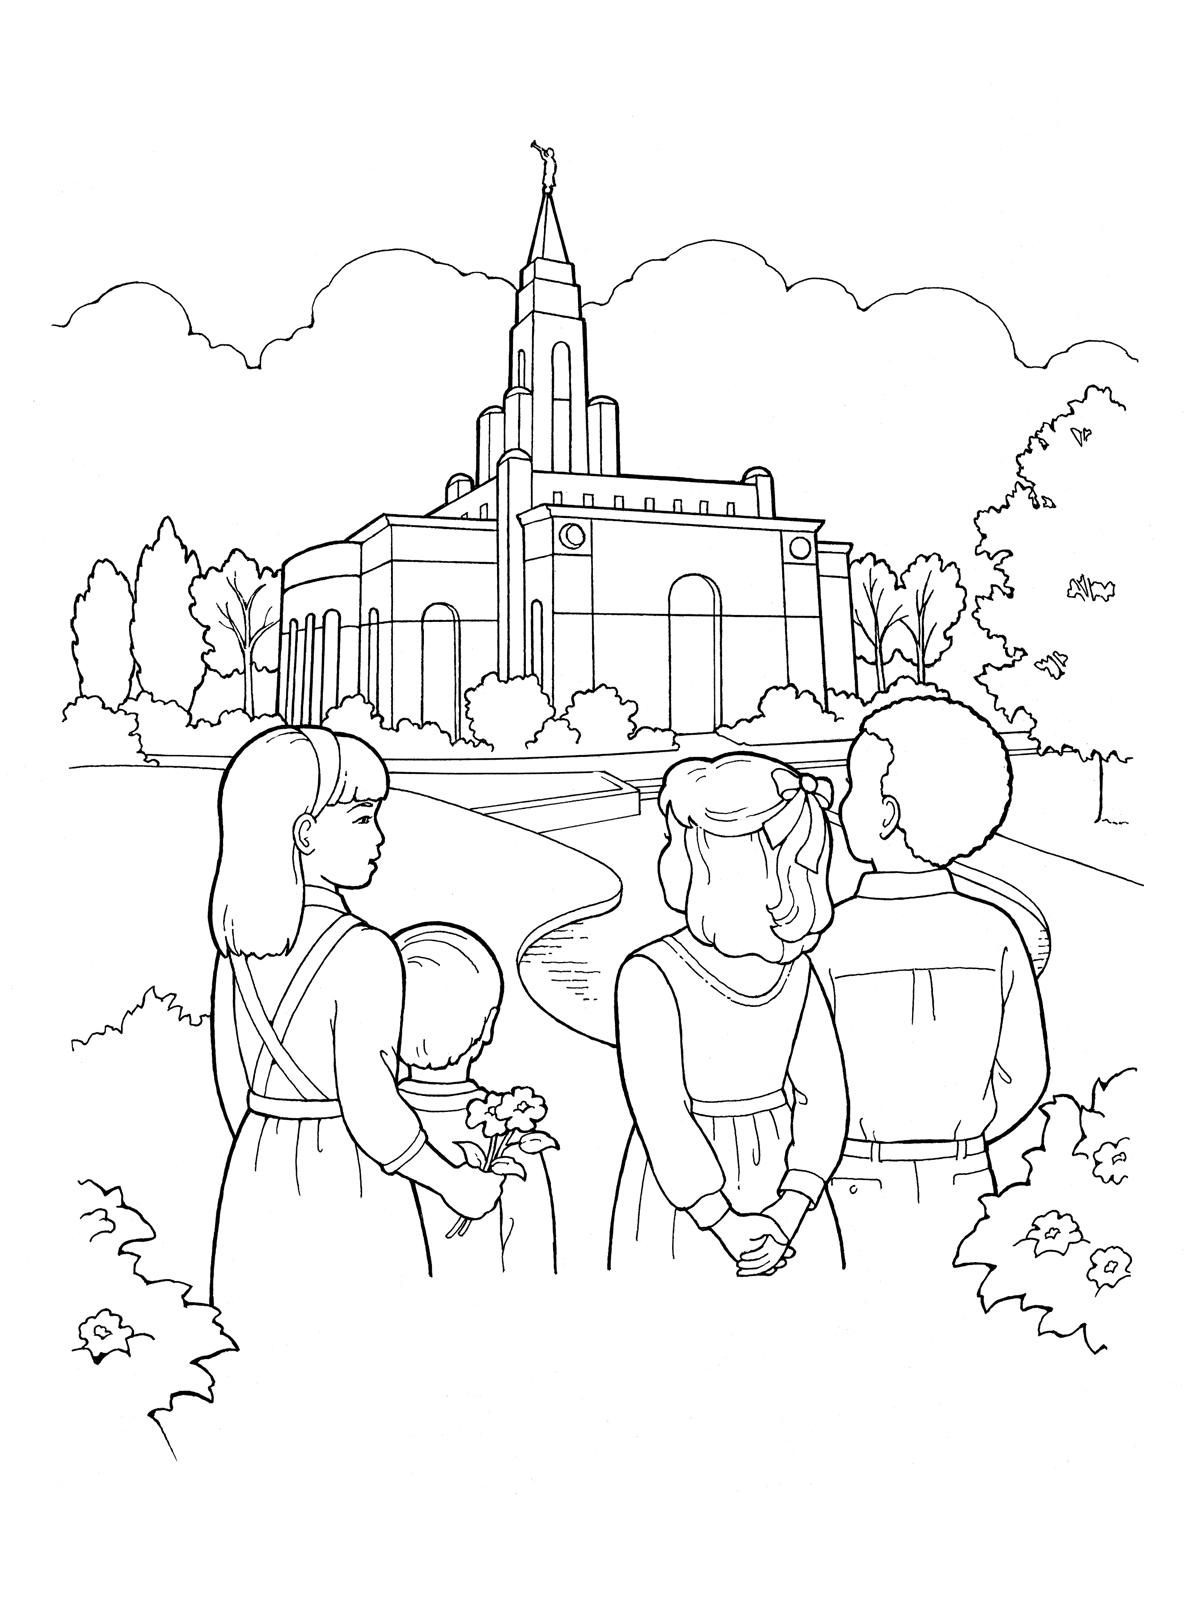 Kids House Drawing: Our Deseret Homeschool: Gospel Basics 38 Week Lesson Plan